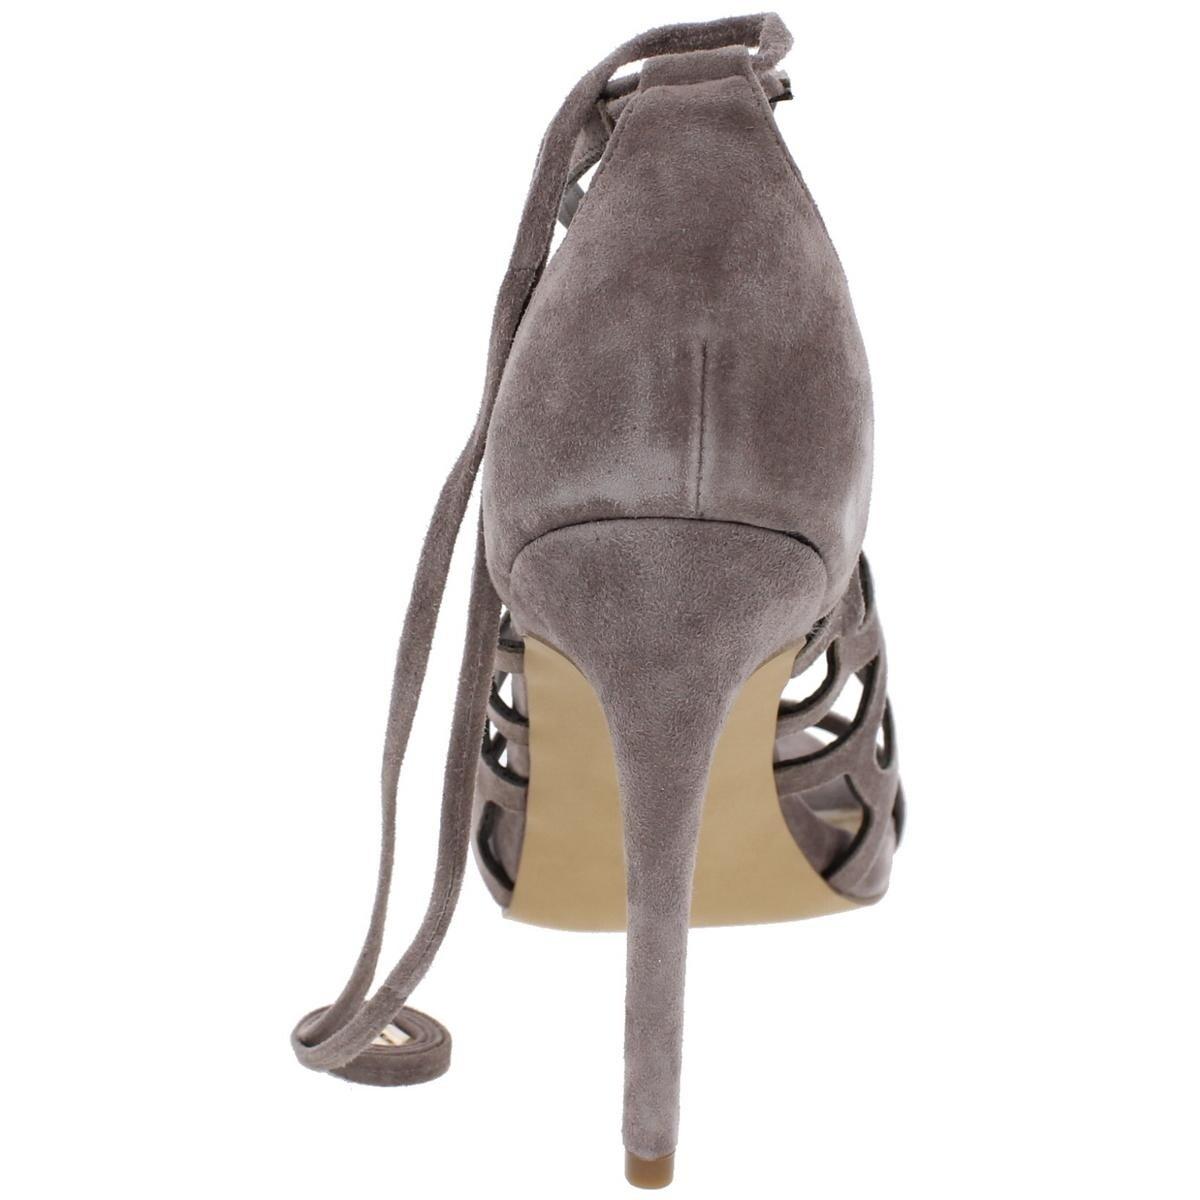 14b799d3654 Shop Steve Madden Womens Zoe Stilettos Open Toe Round Toe - 10 medium (b